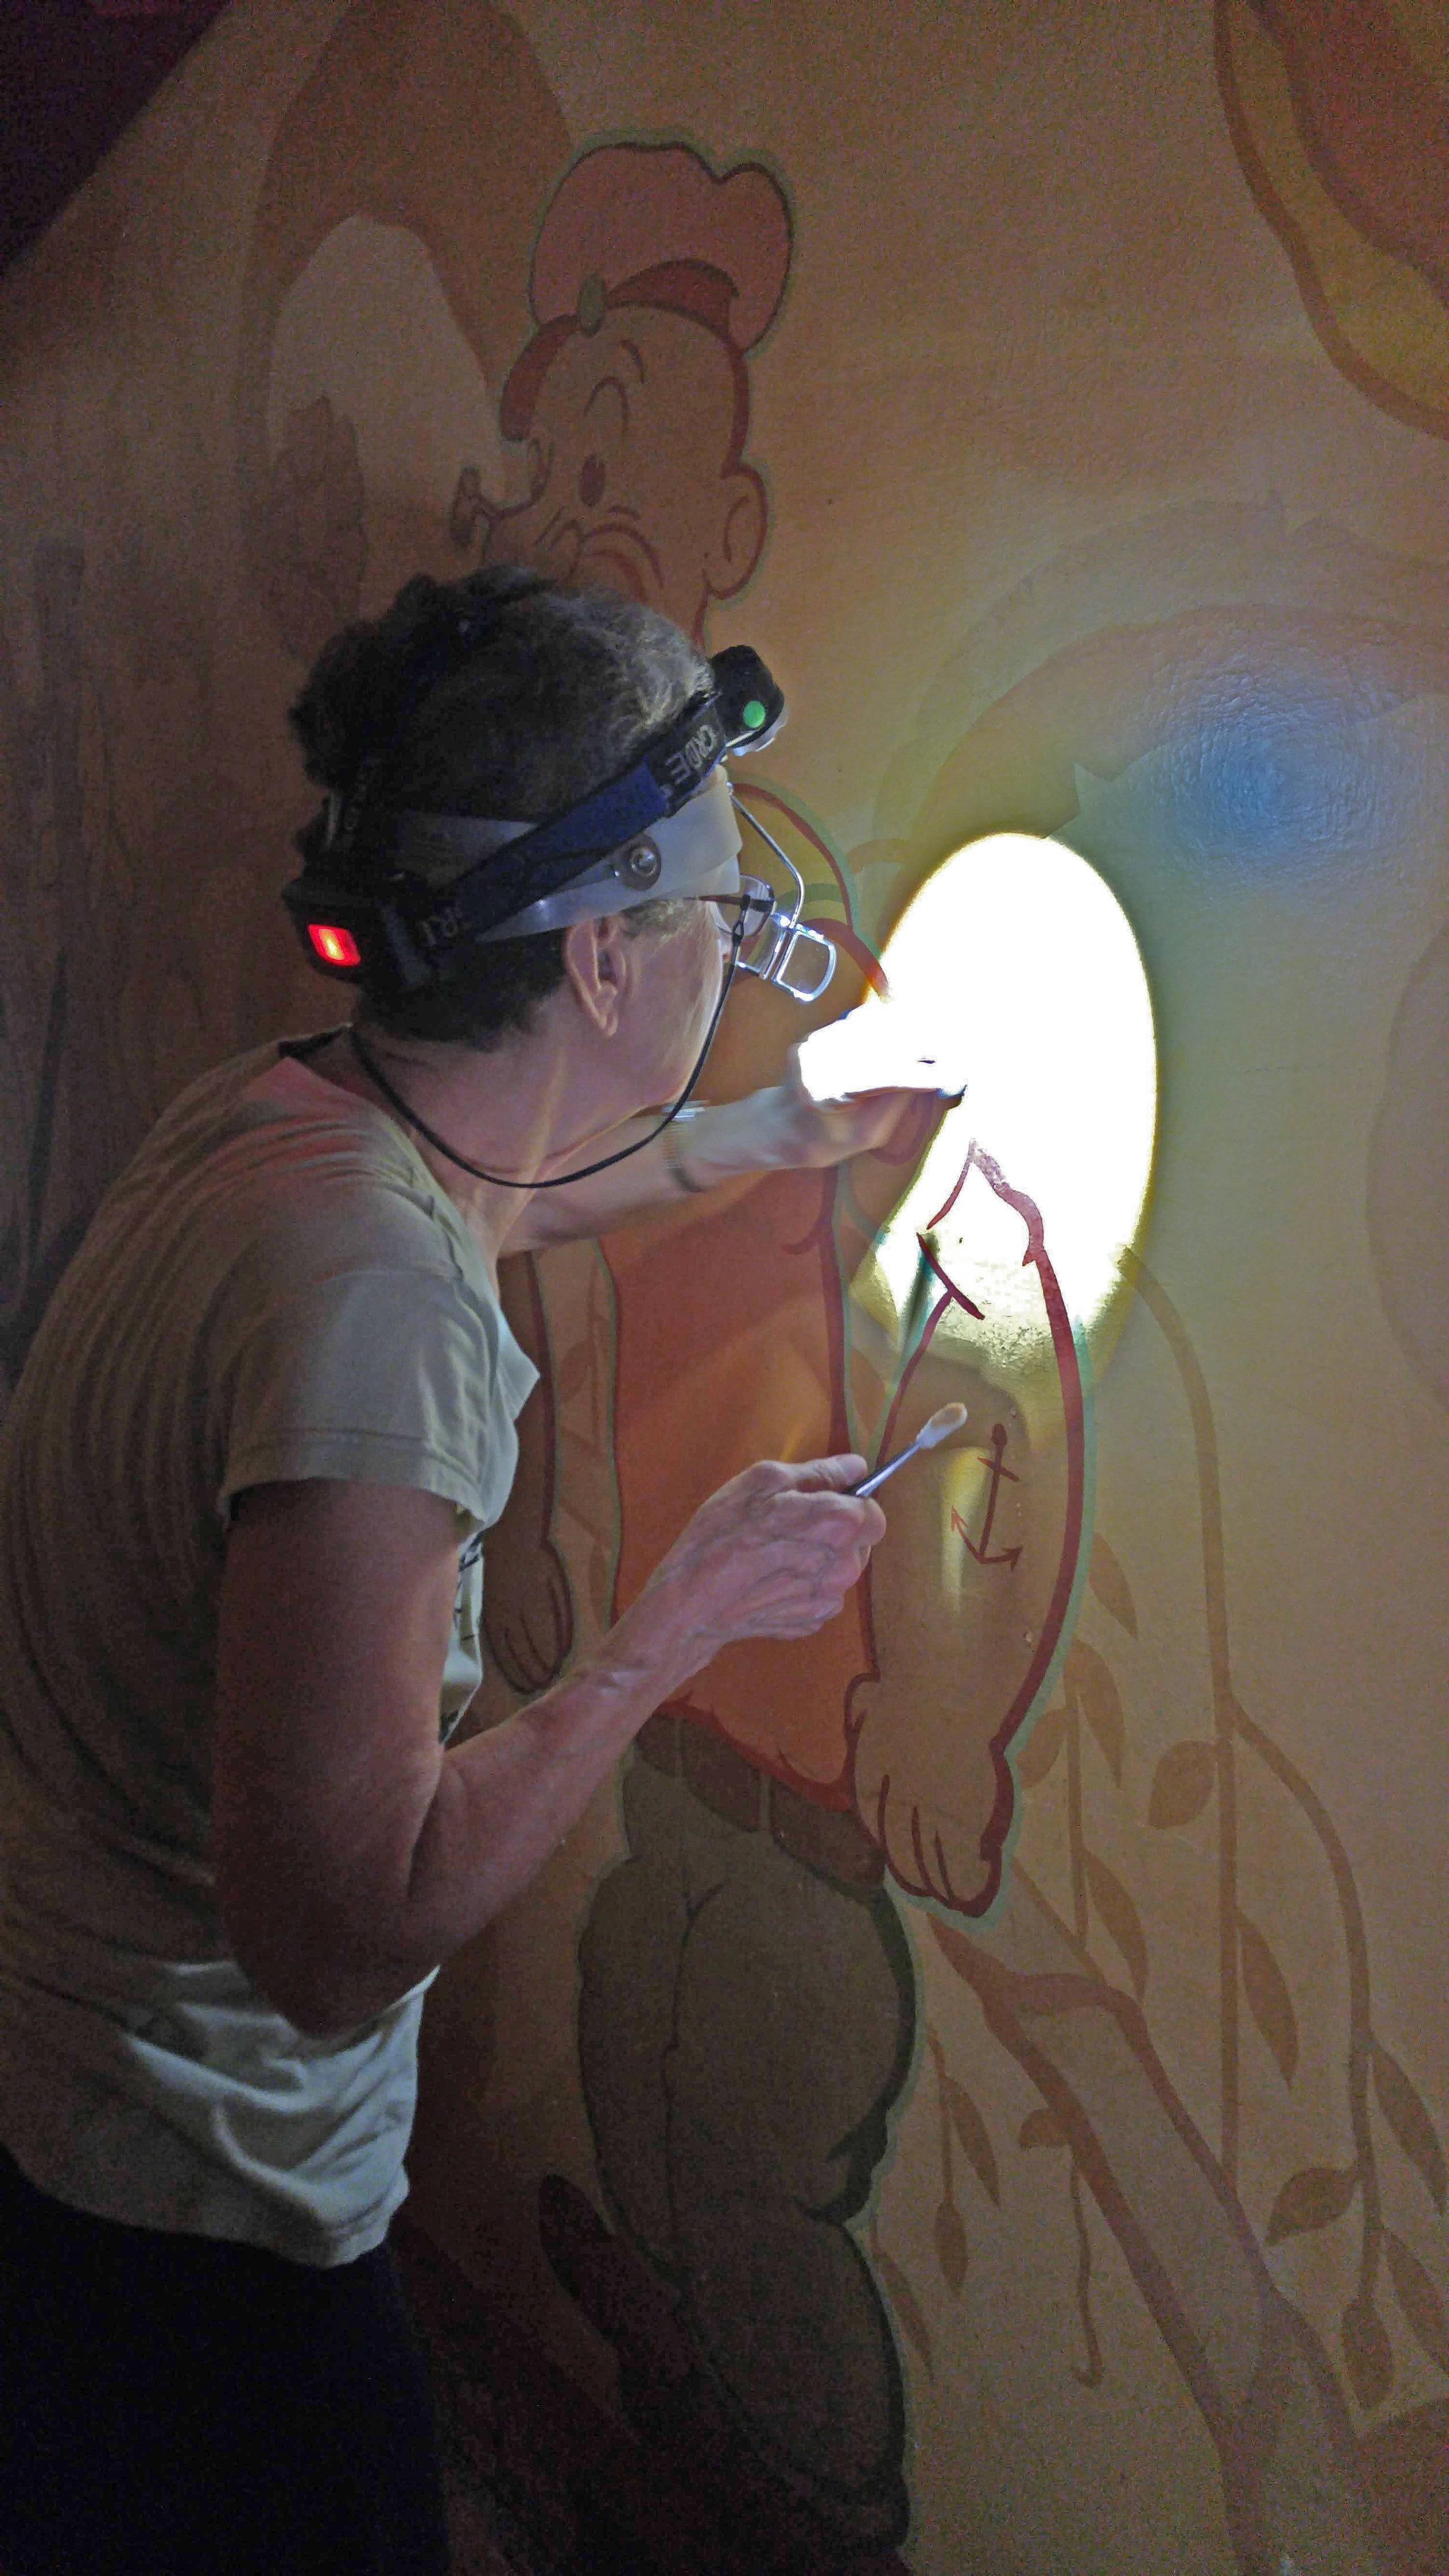 Stashka Star examines the Lakewood Theater mural.